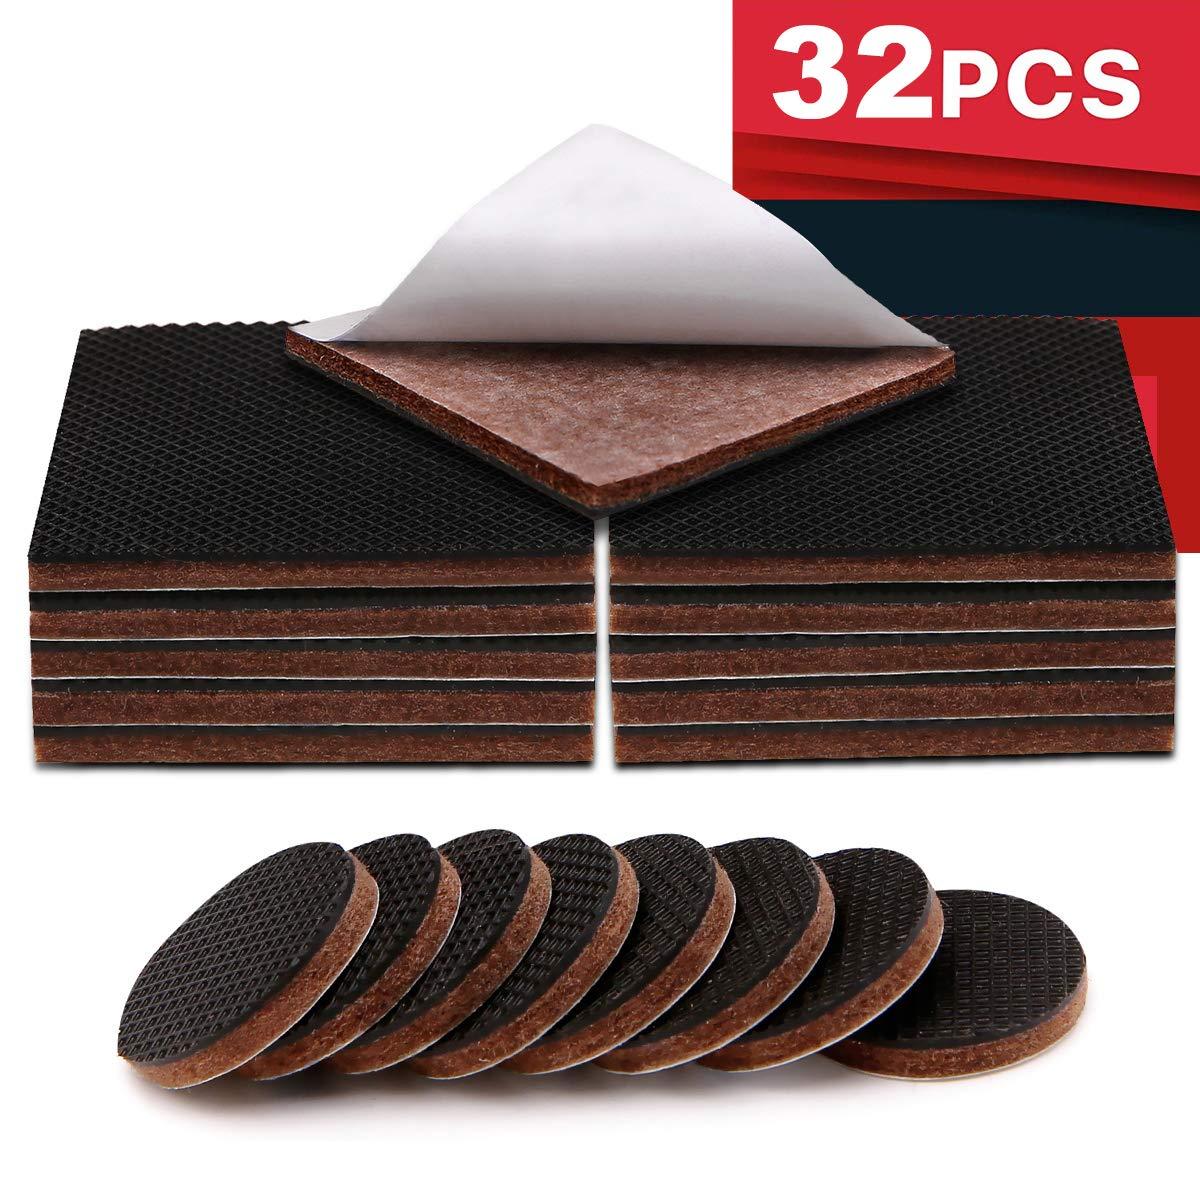 "RIZUGG Furniture Pads,Non Slip 3M Self Adhesive Furniture Gripper 16 pcs 2"" Add 16 pcs 1"" Silicone Felt Protect Your Hardwood Flooring"